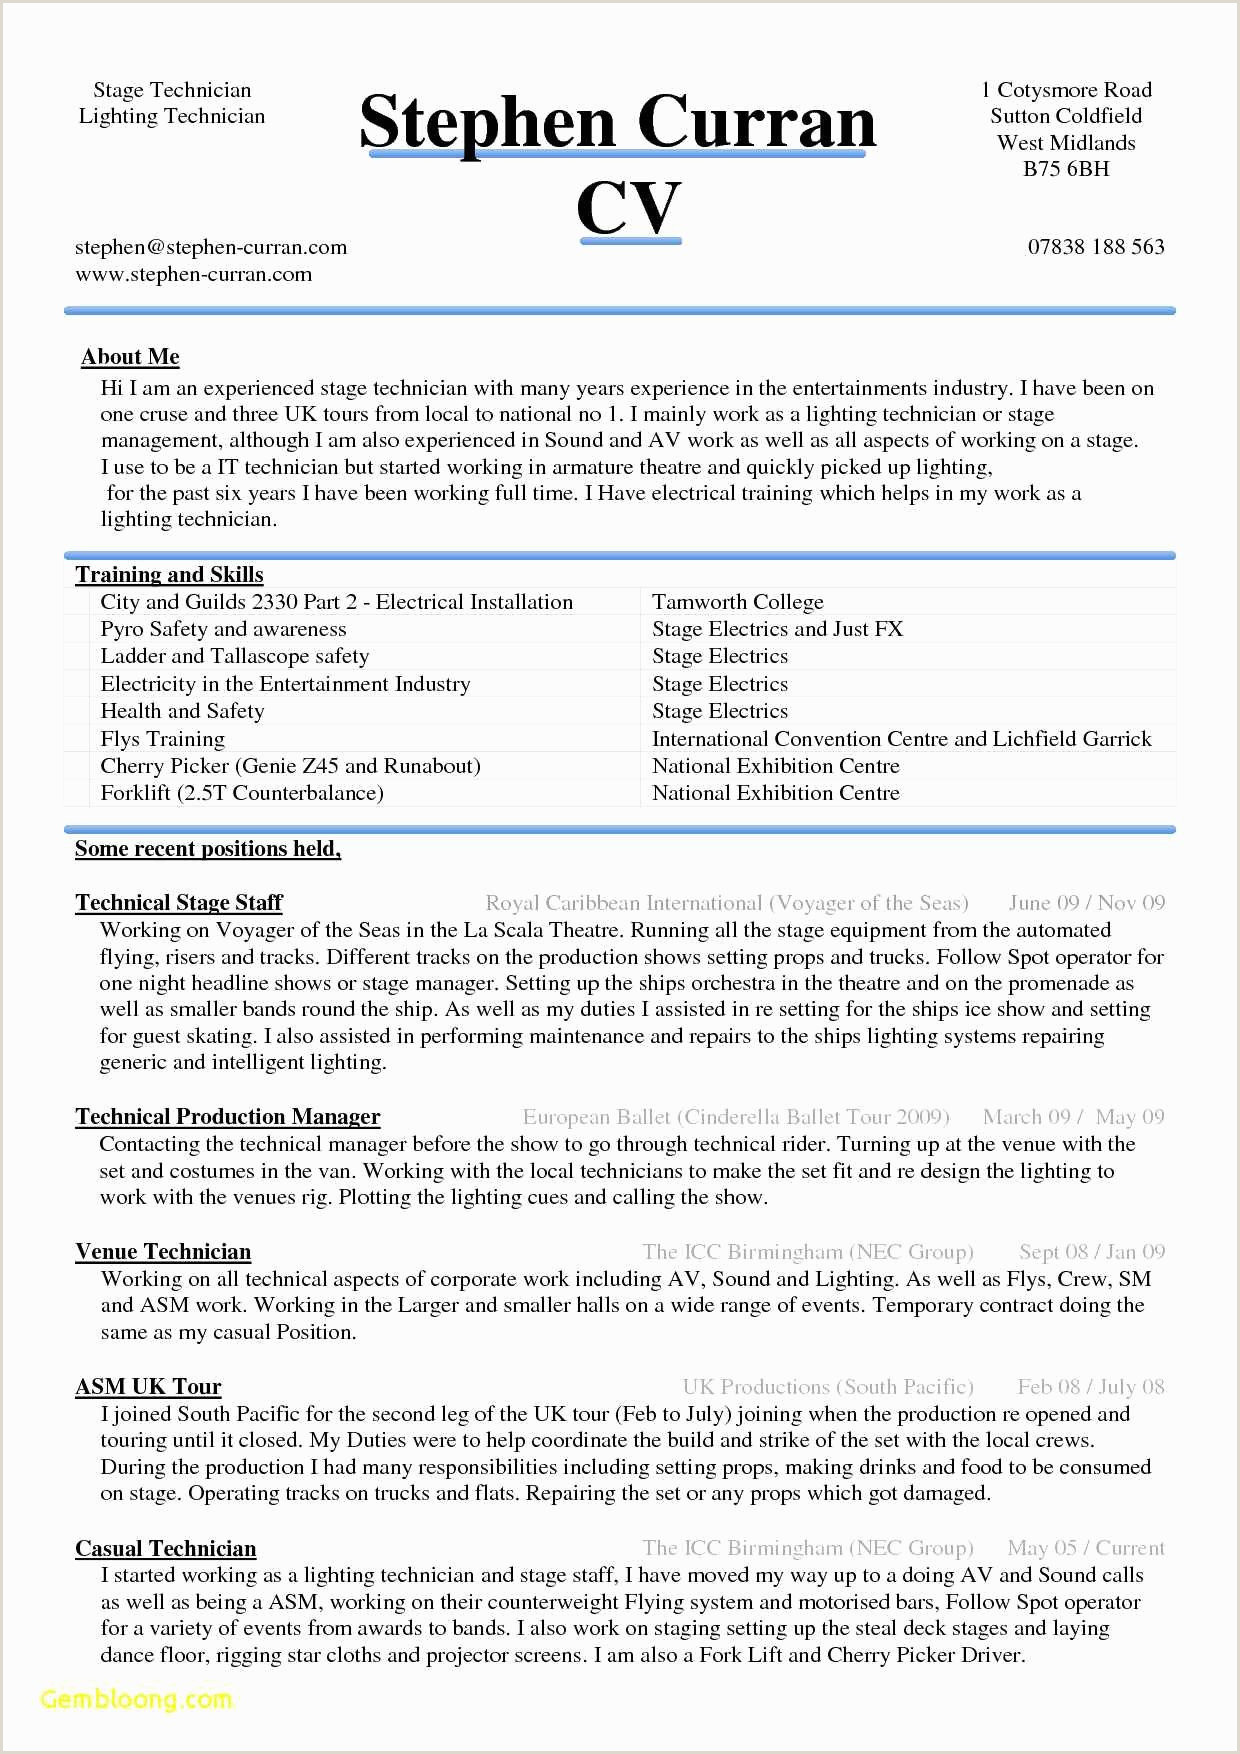 Hairstyles Cv Resume Template Newest Microsoft Word Resume